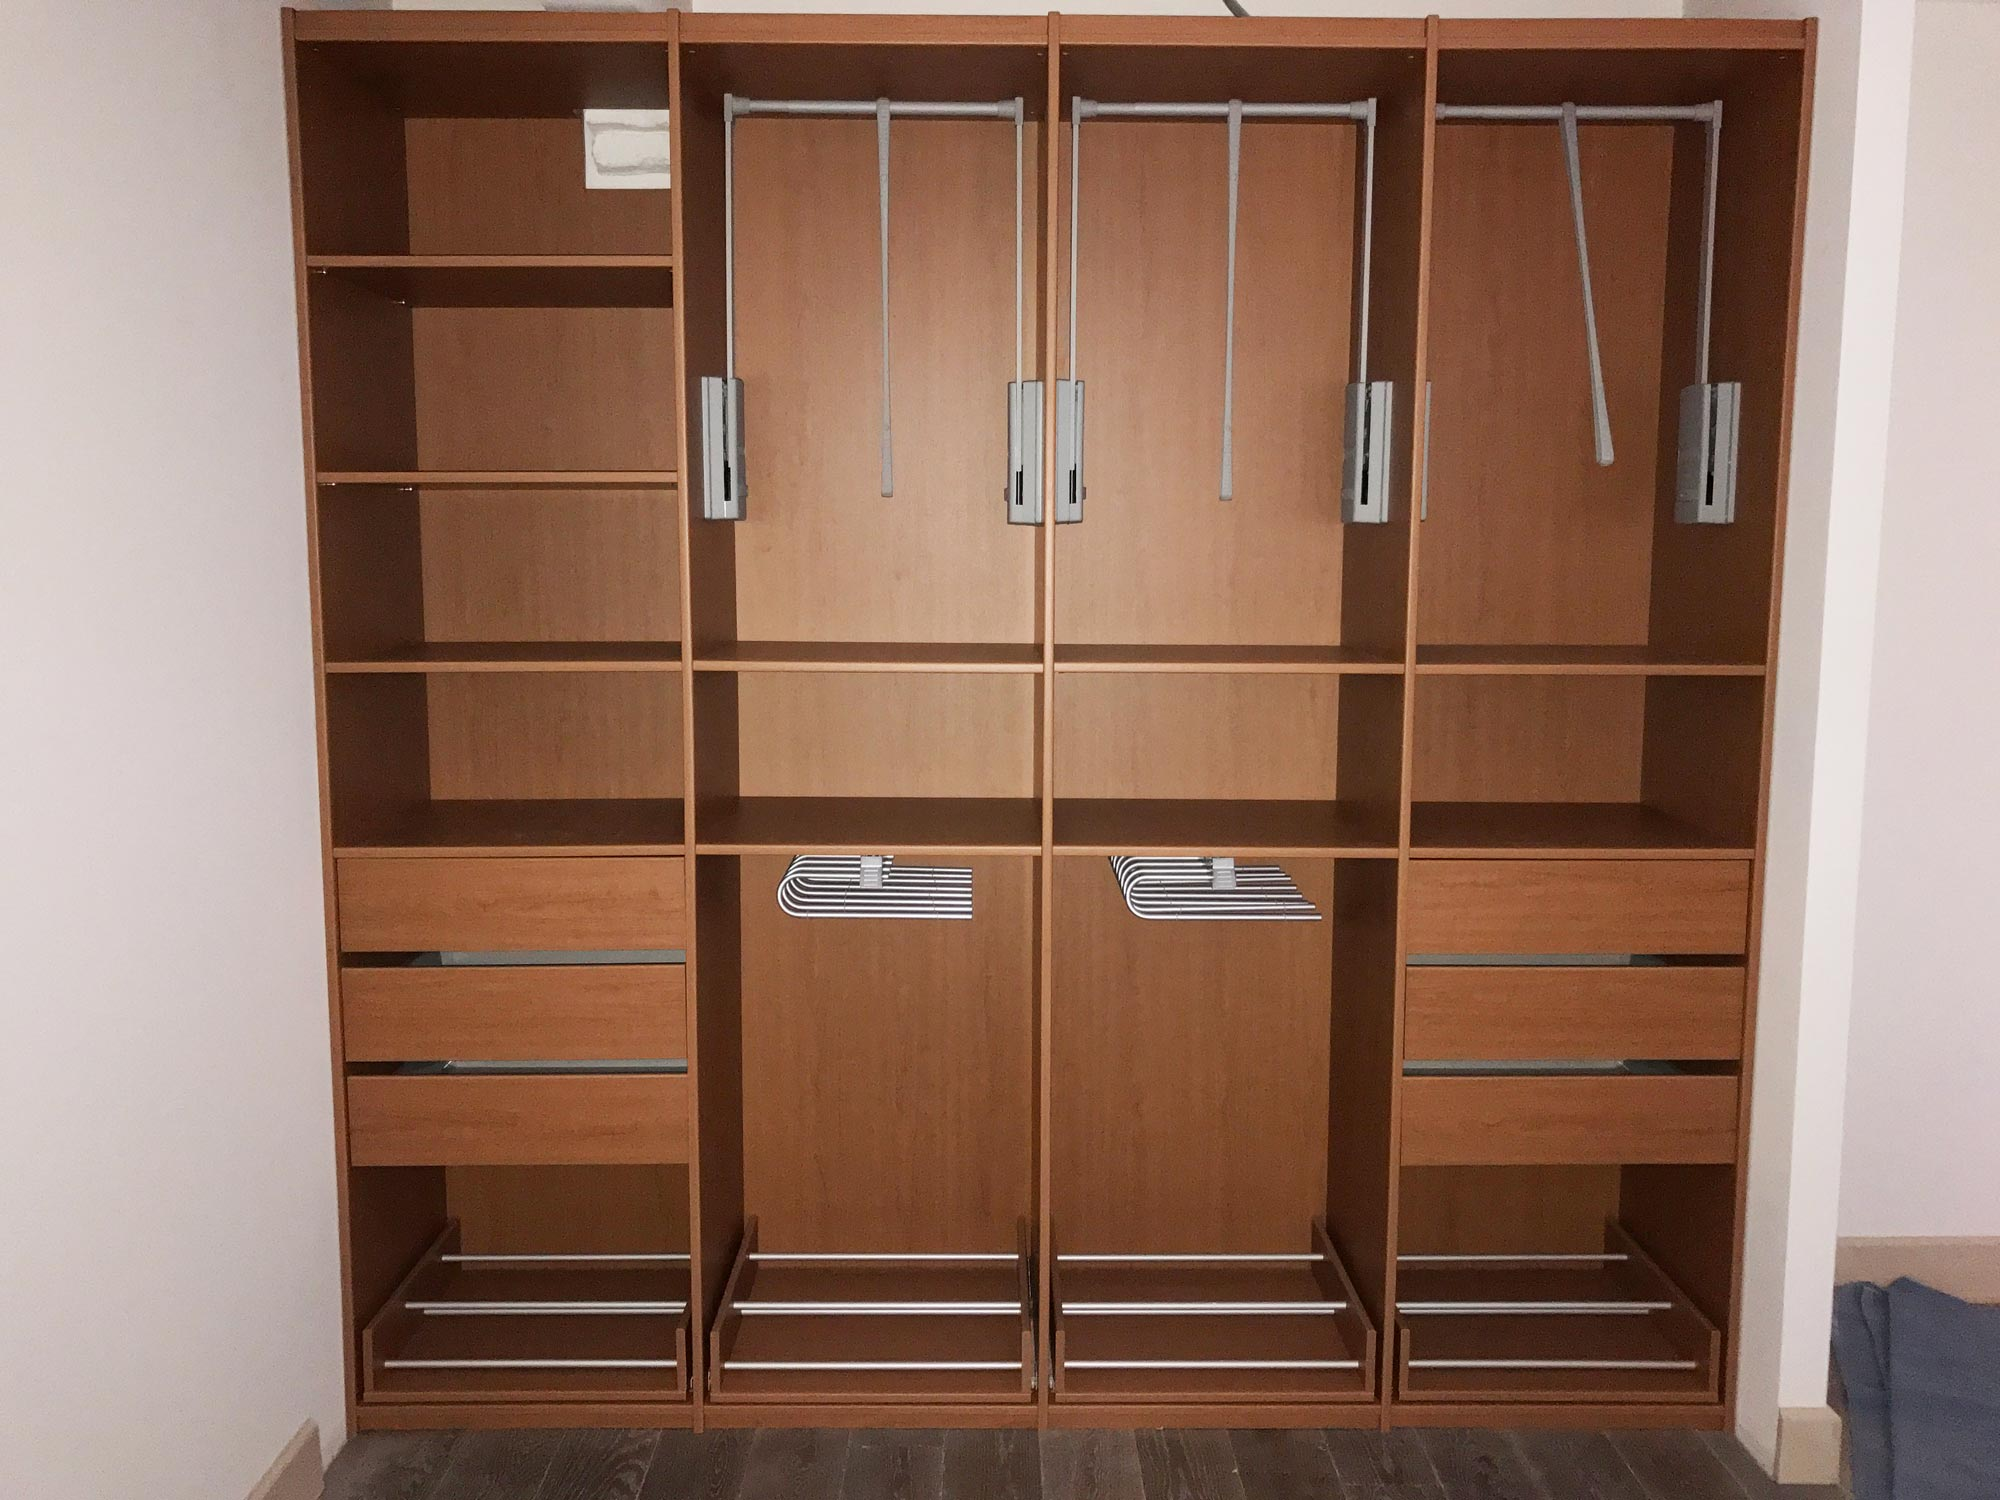 armoire ou dressing cheap armoire ranger ou jeter with armoire ou dressing trendy dressing de. Black Bedroom Furniture Sets. Home Design Ideas